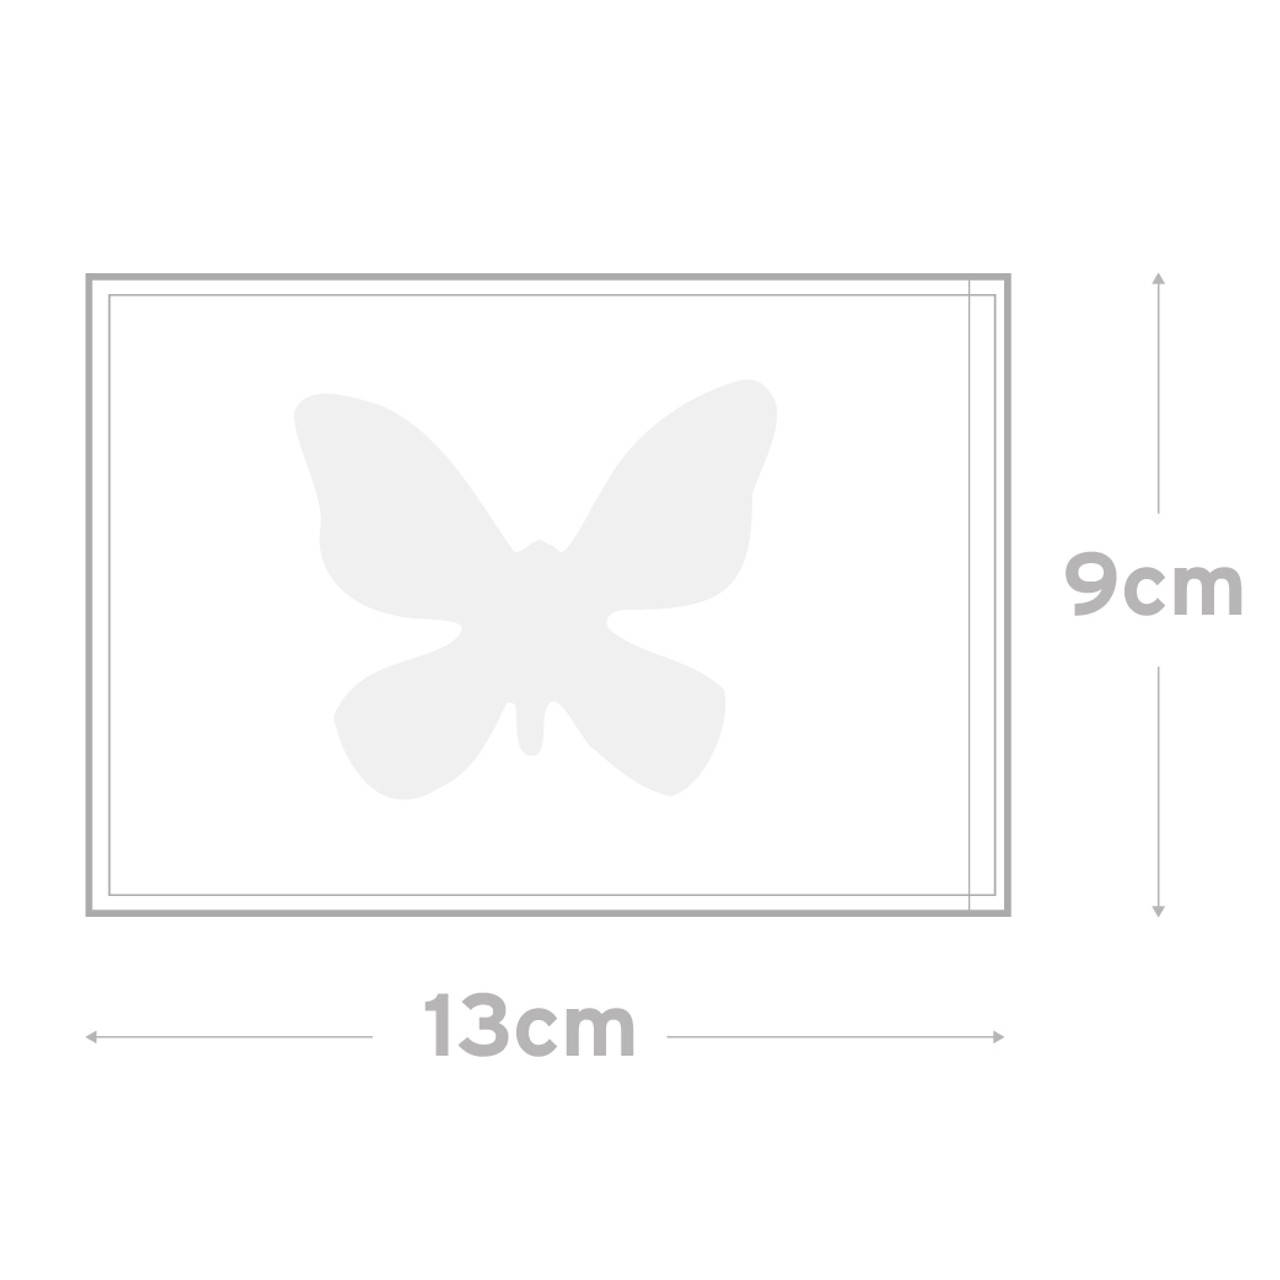 Peel & Seal Bag  Pkt 100 -    9.0 x 13.0 cms